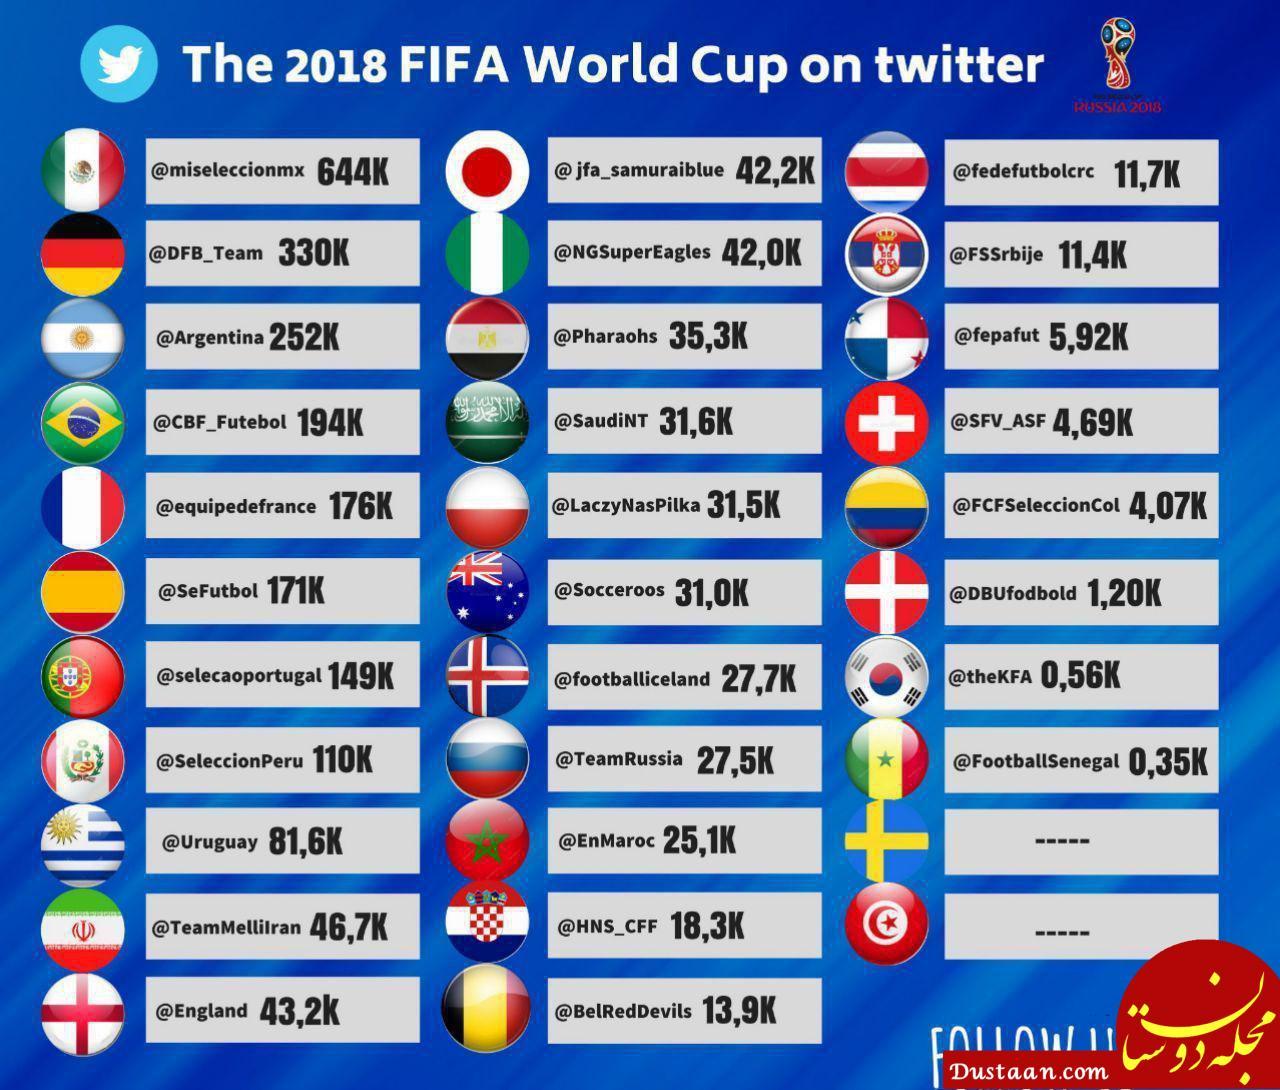 www.dustaan.com ایران در رده دهم محبوب ترین تیم های جام جهانی در توییتر